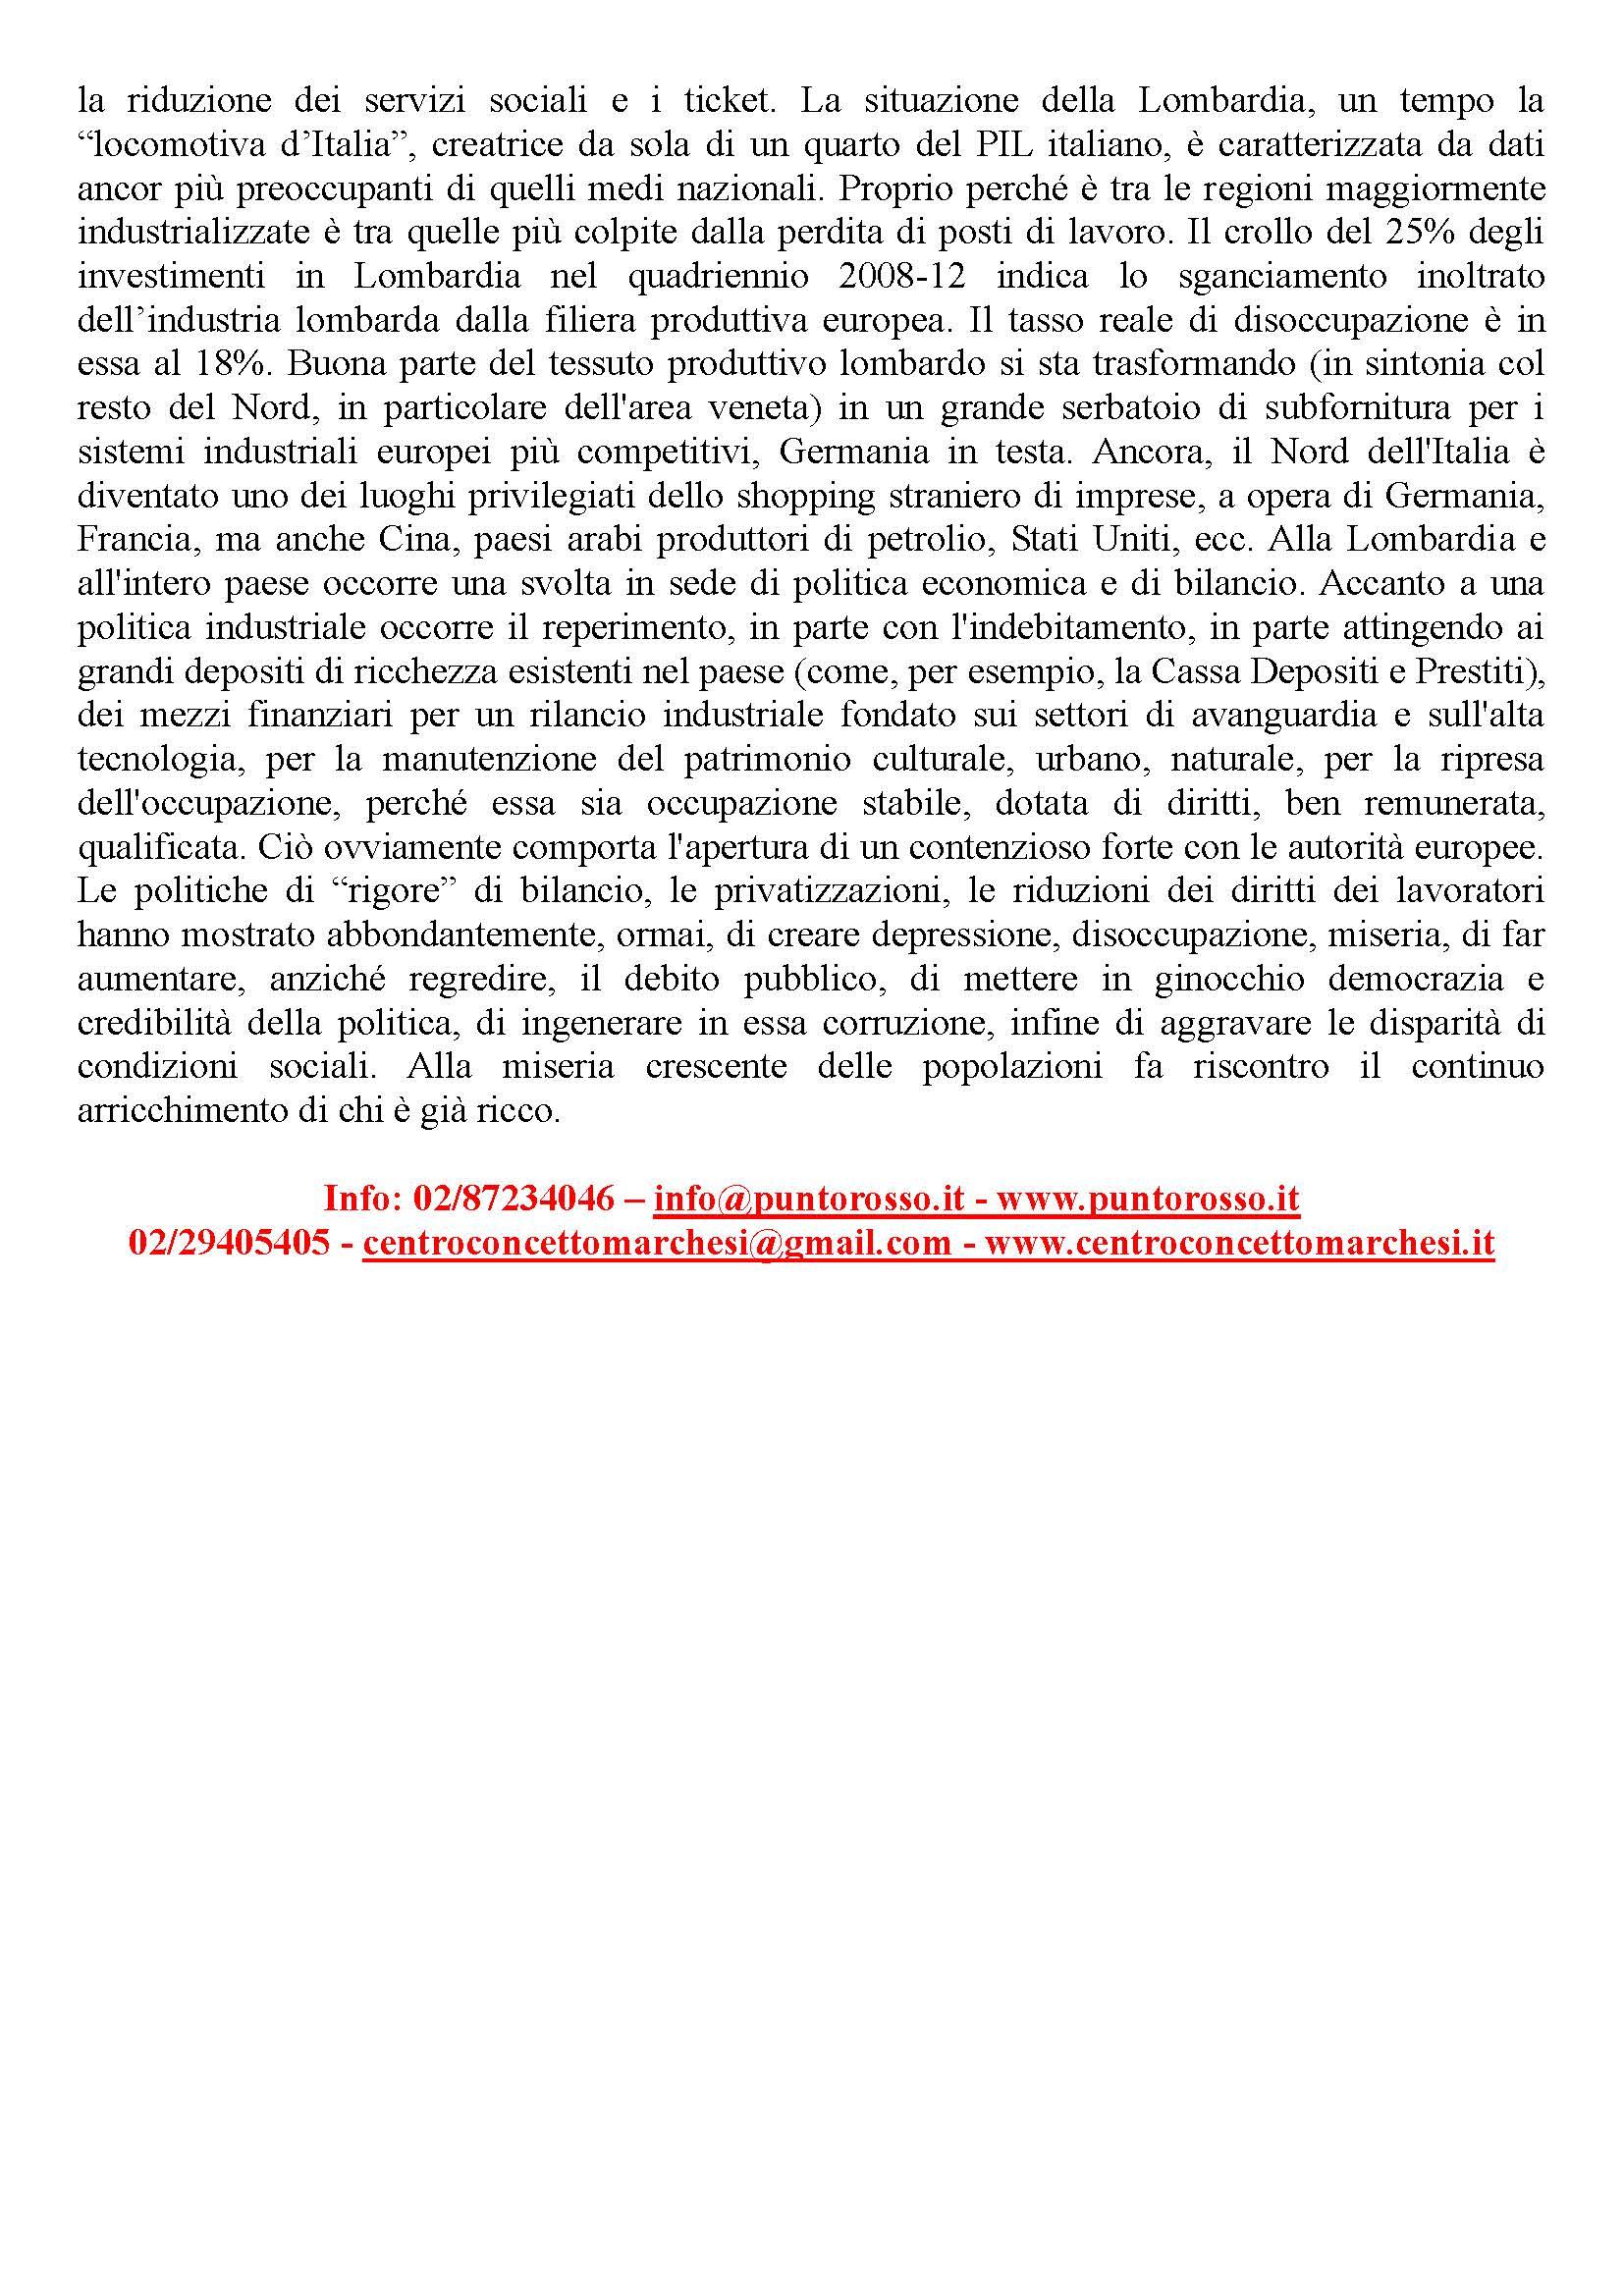 Ass-5Ottobre-Programma_Pagina_2